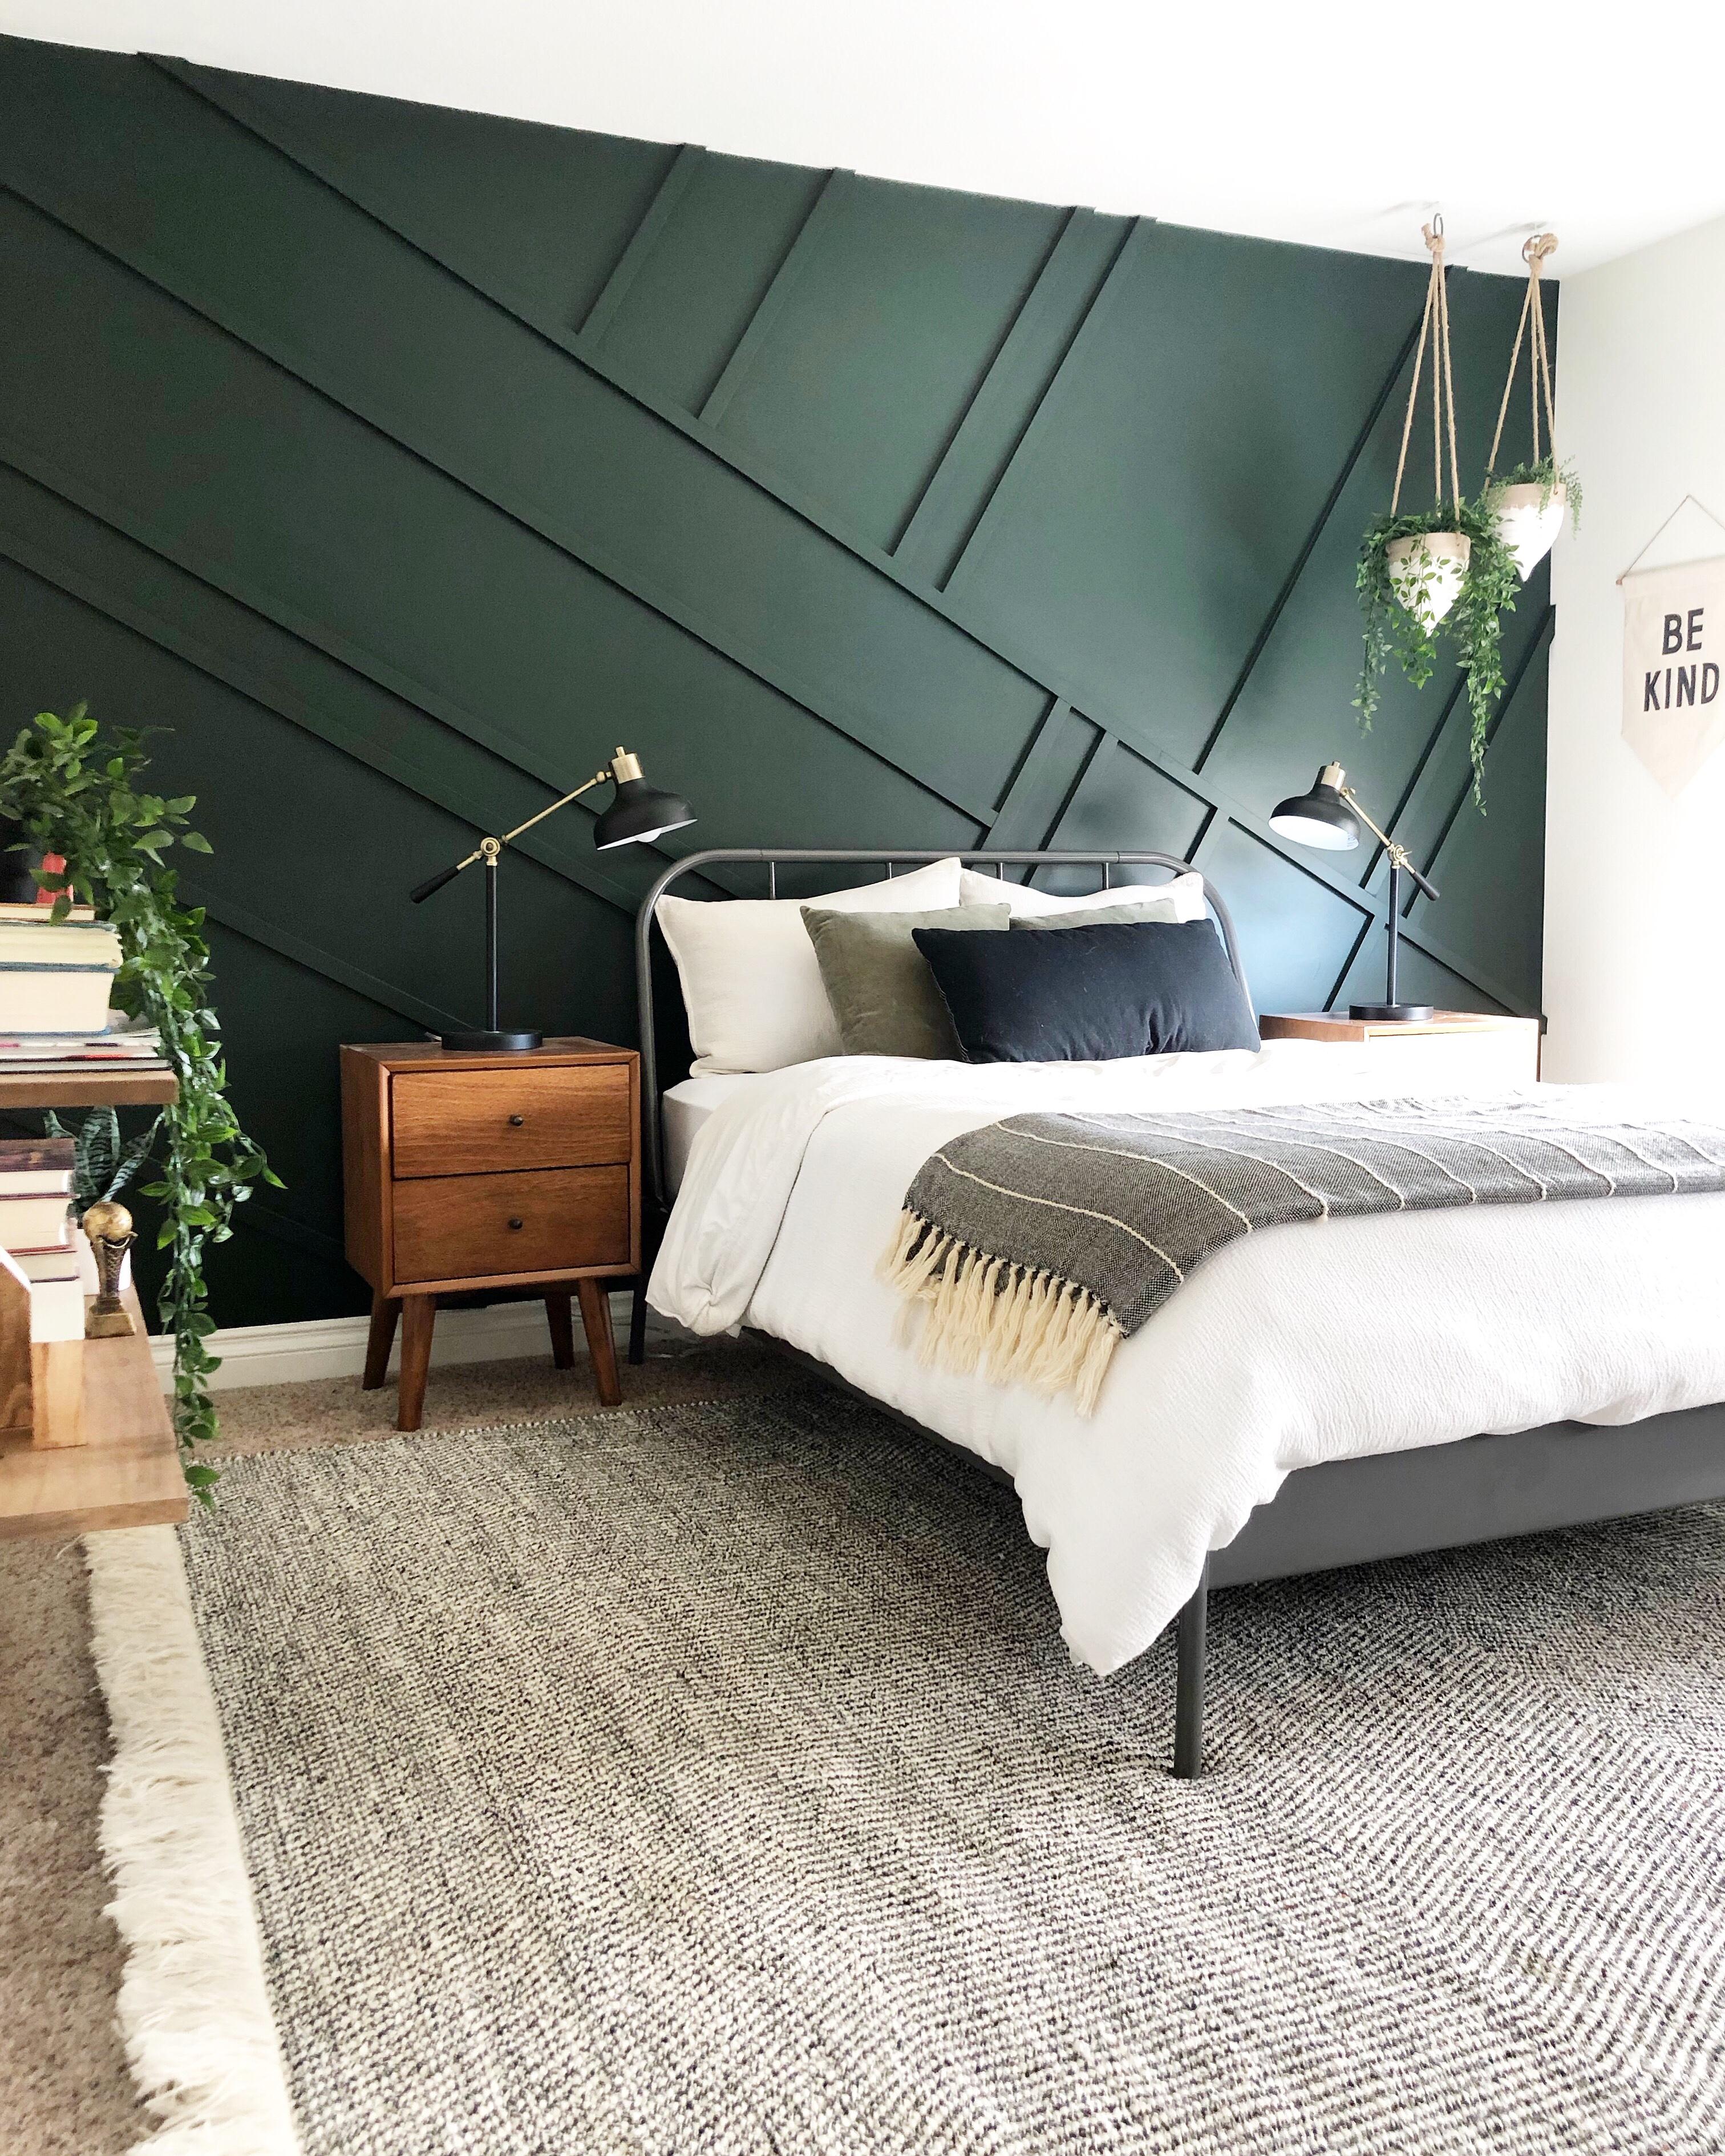 Decorating With Emerald Green Welsh Design Studio